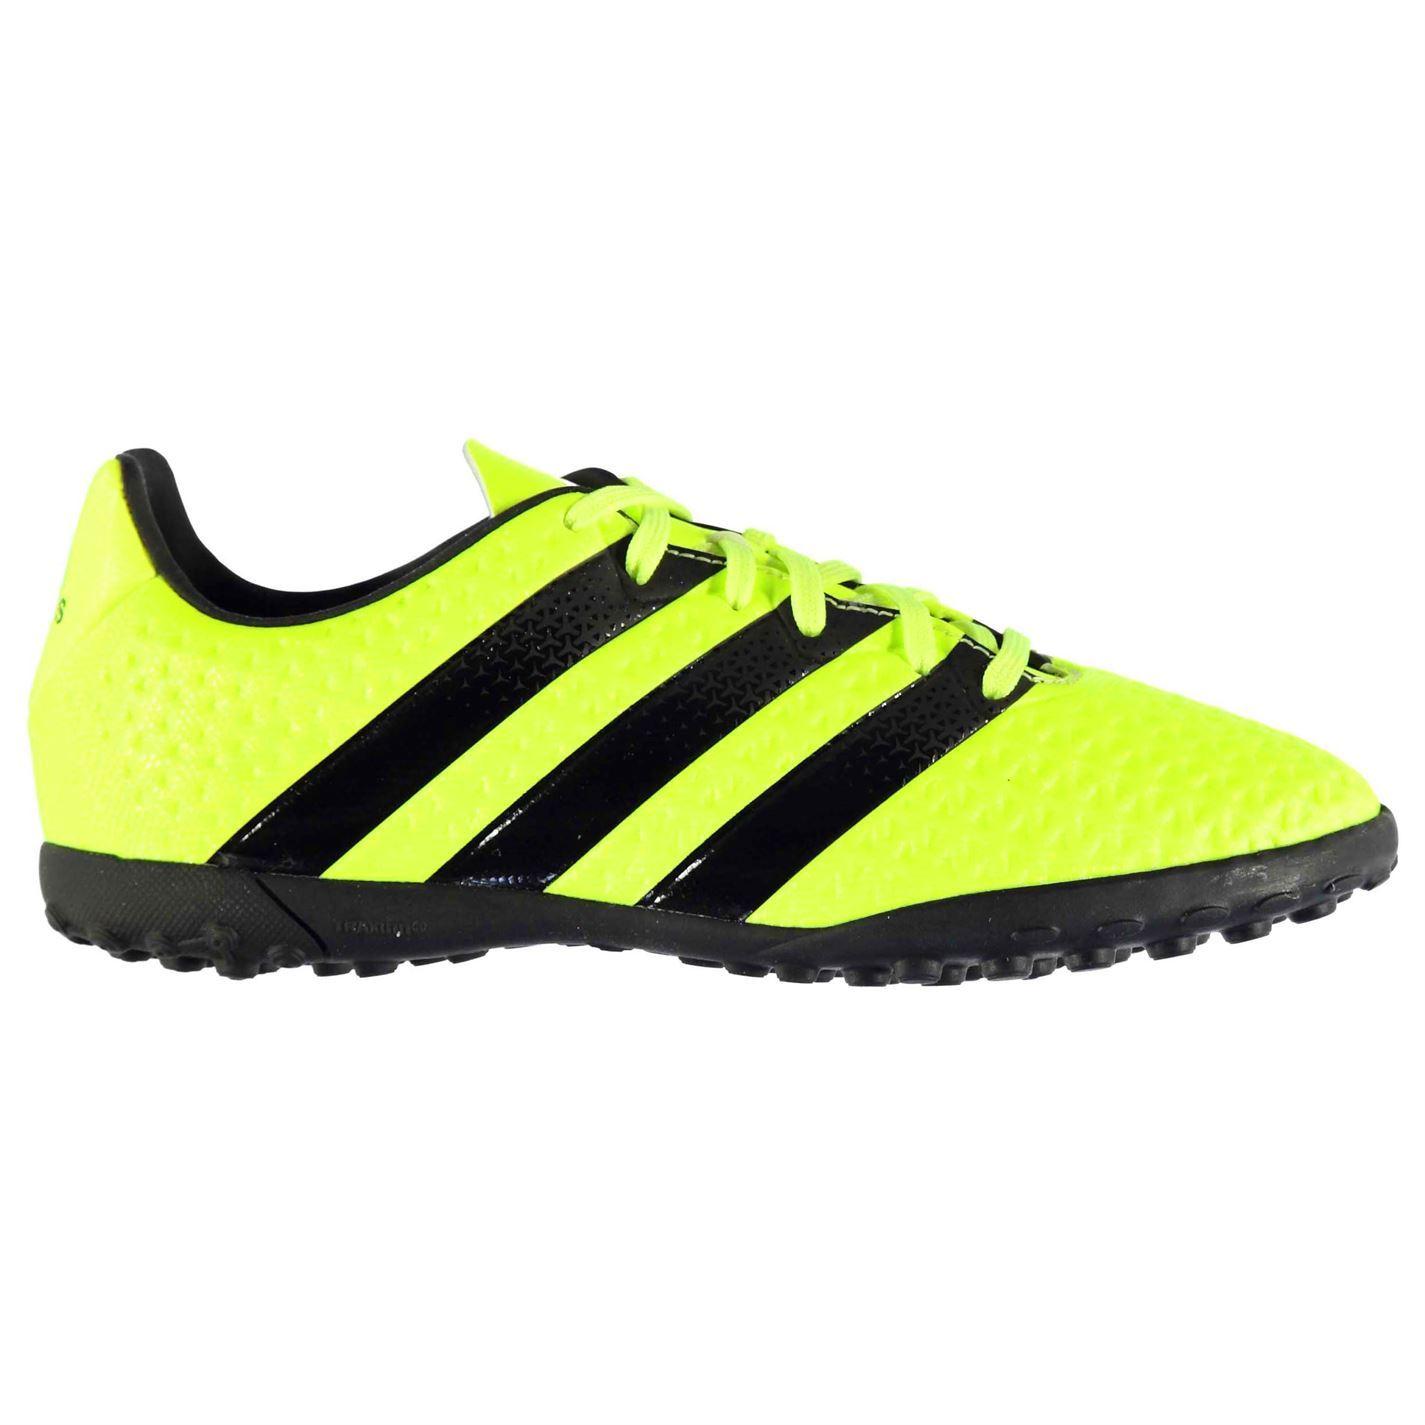 de3ef7615 ... usa adidas ace 16.4 astro ag artificial grass trainers juniors yellow  soccer shoes f7c16 a8462